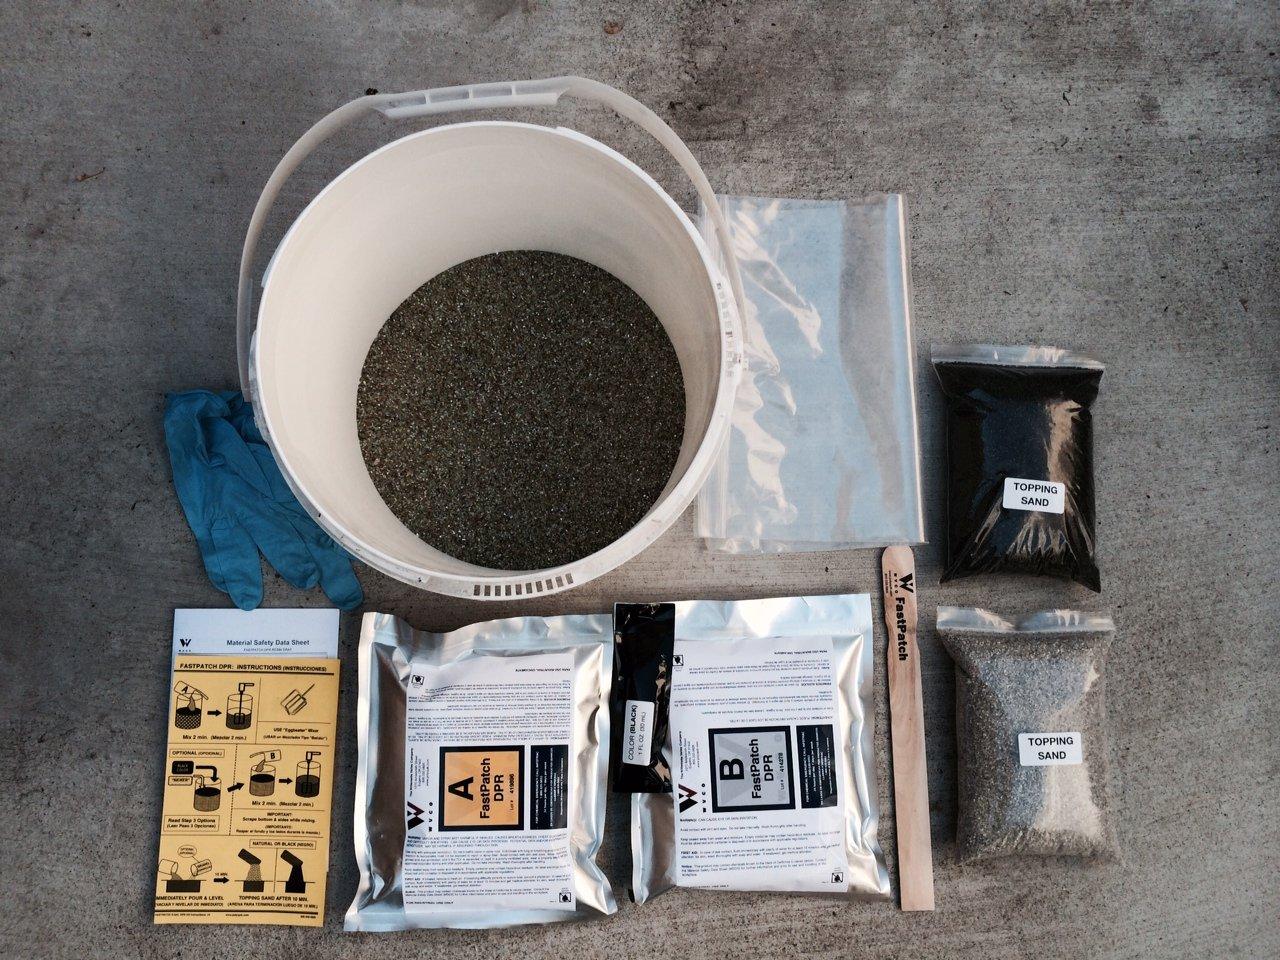 Polymeric Asphalt Patch FASTPATCH DPR Pourable Asphalt Repair 5-Gal Kit